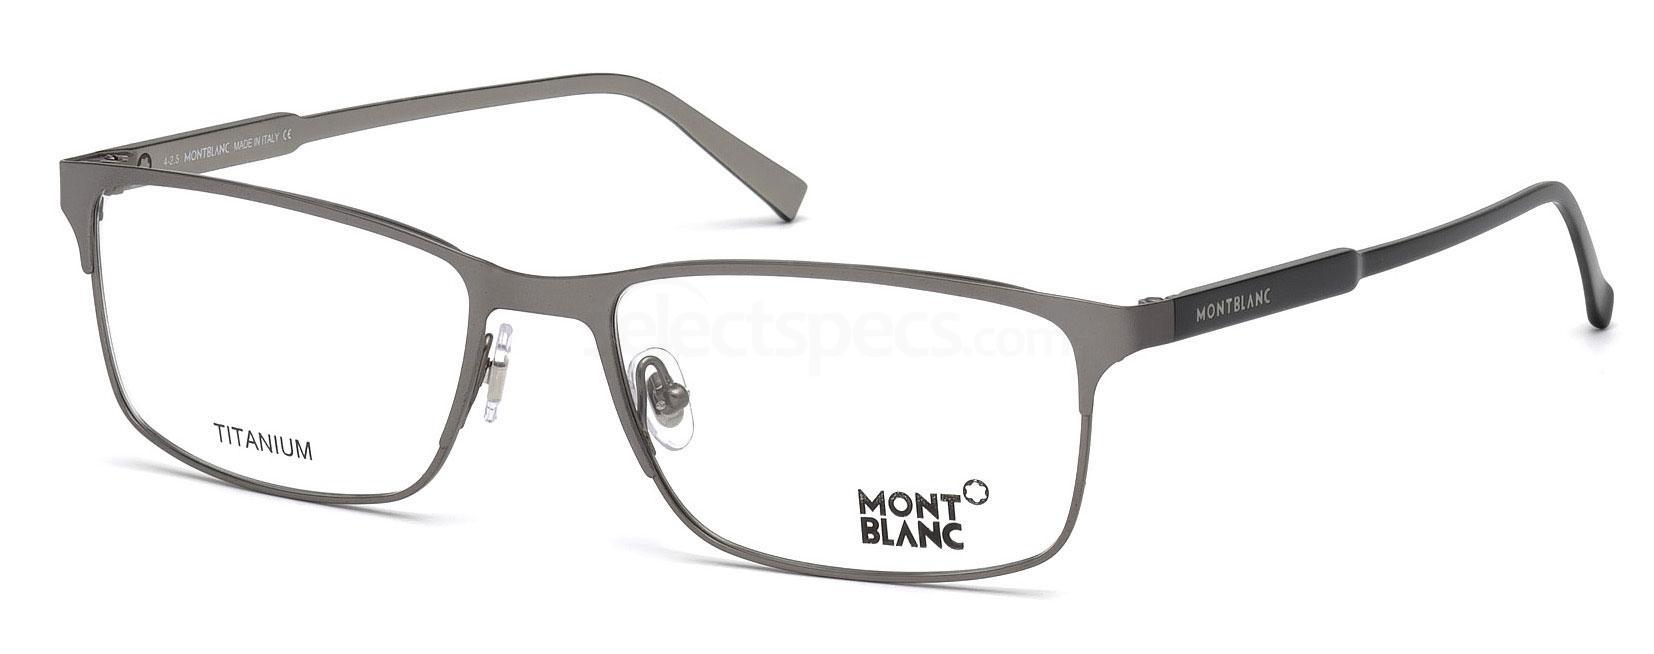 015 MB0627 Glasses, Mont Blanc